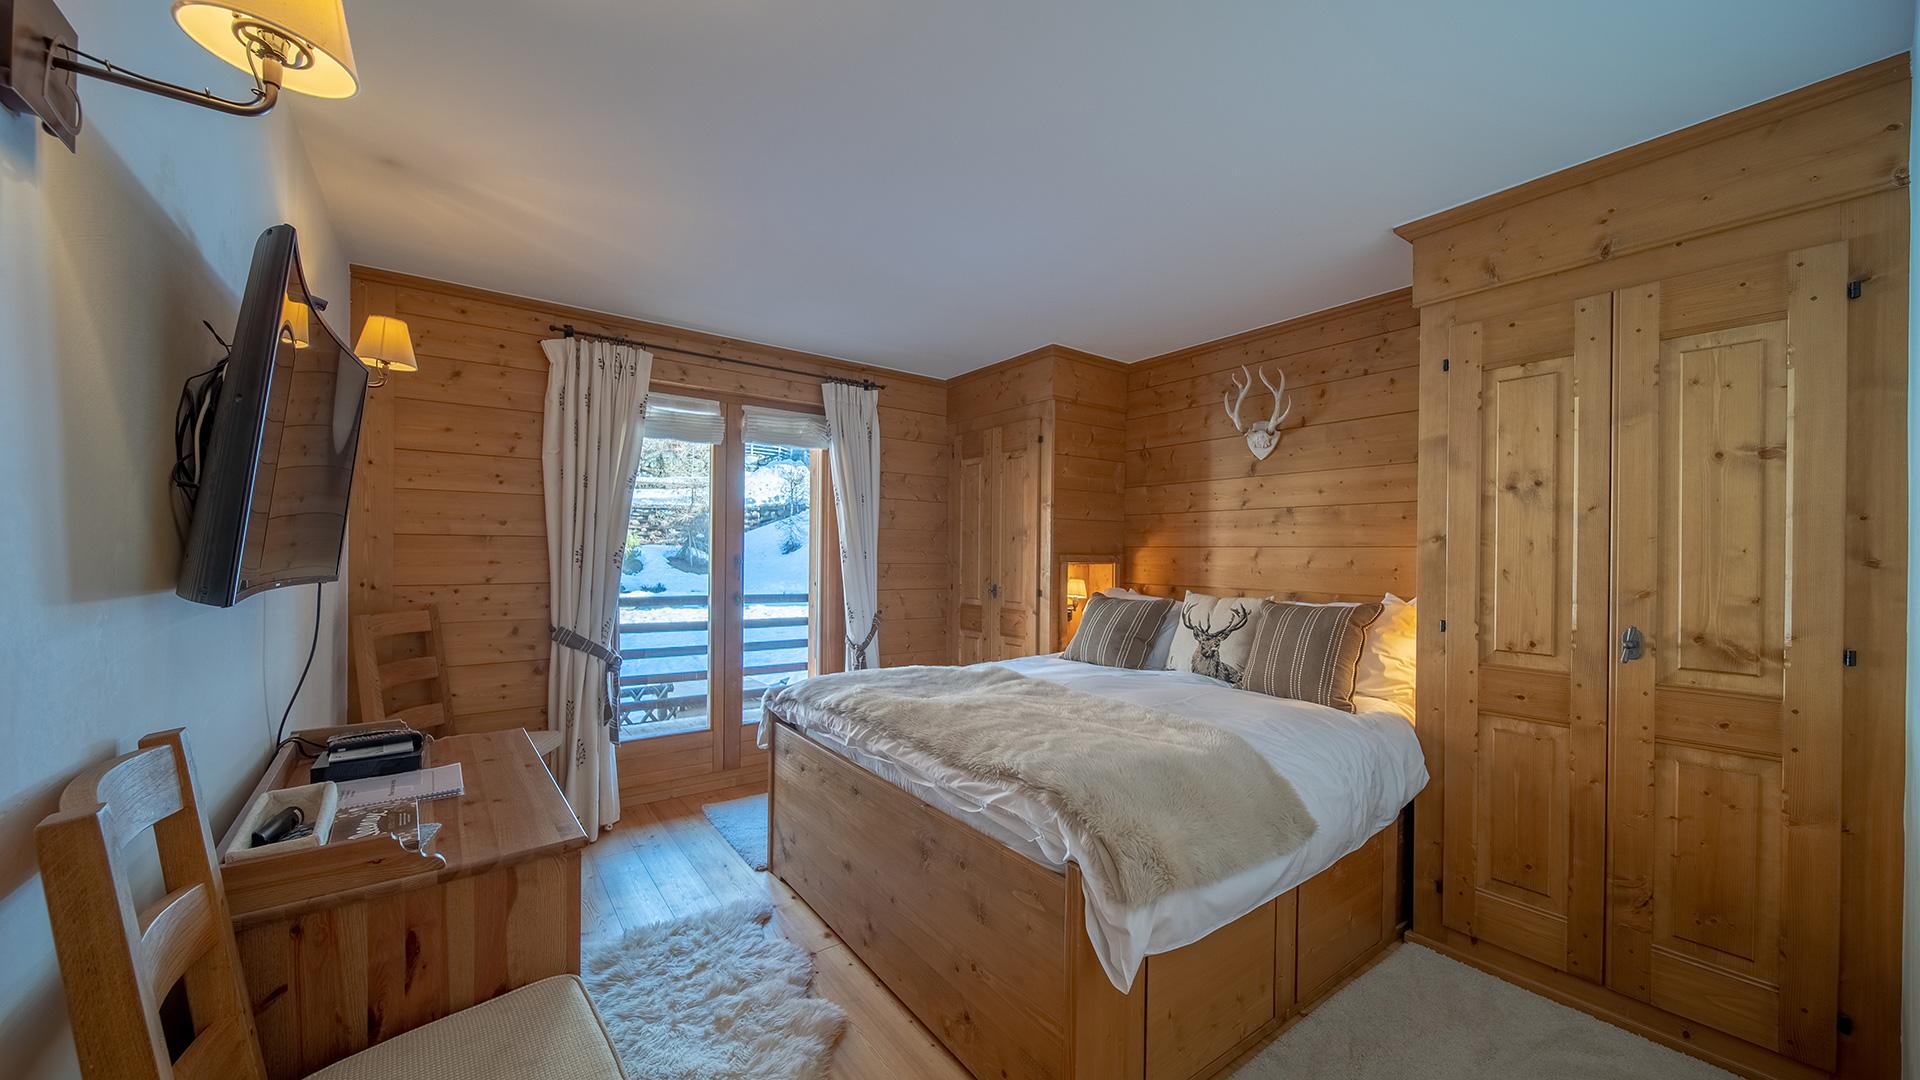 Grand Soleil 232 Apartments, Switzerland